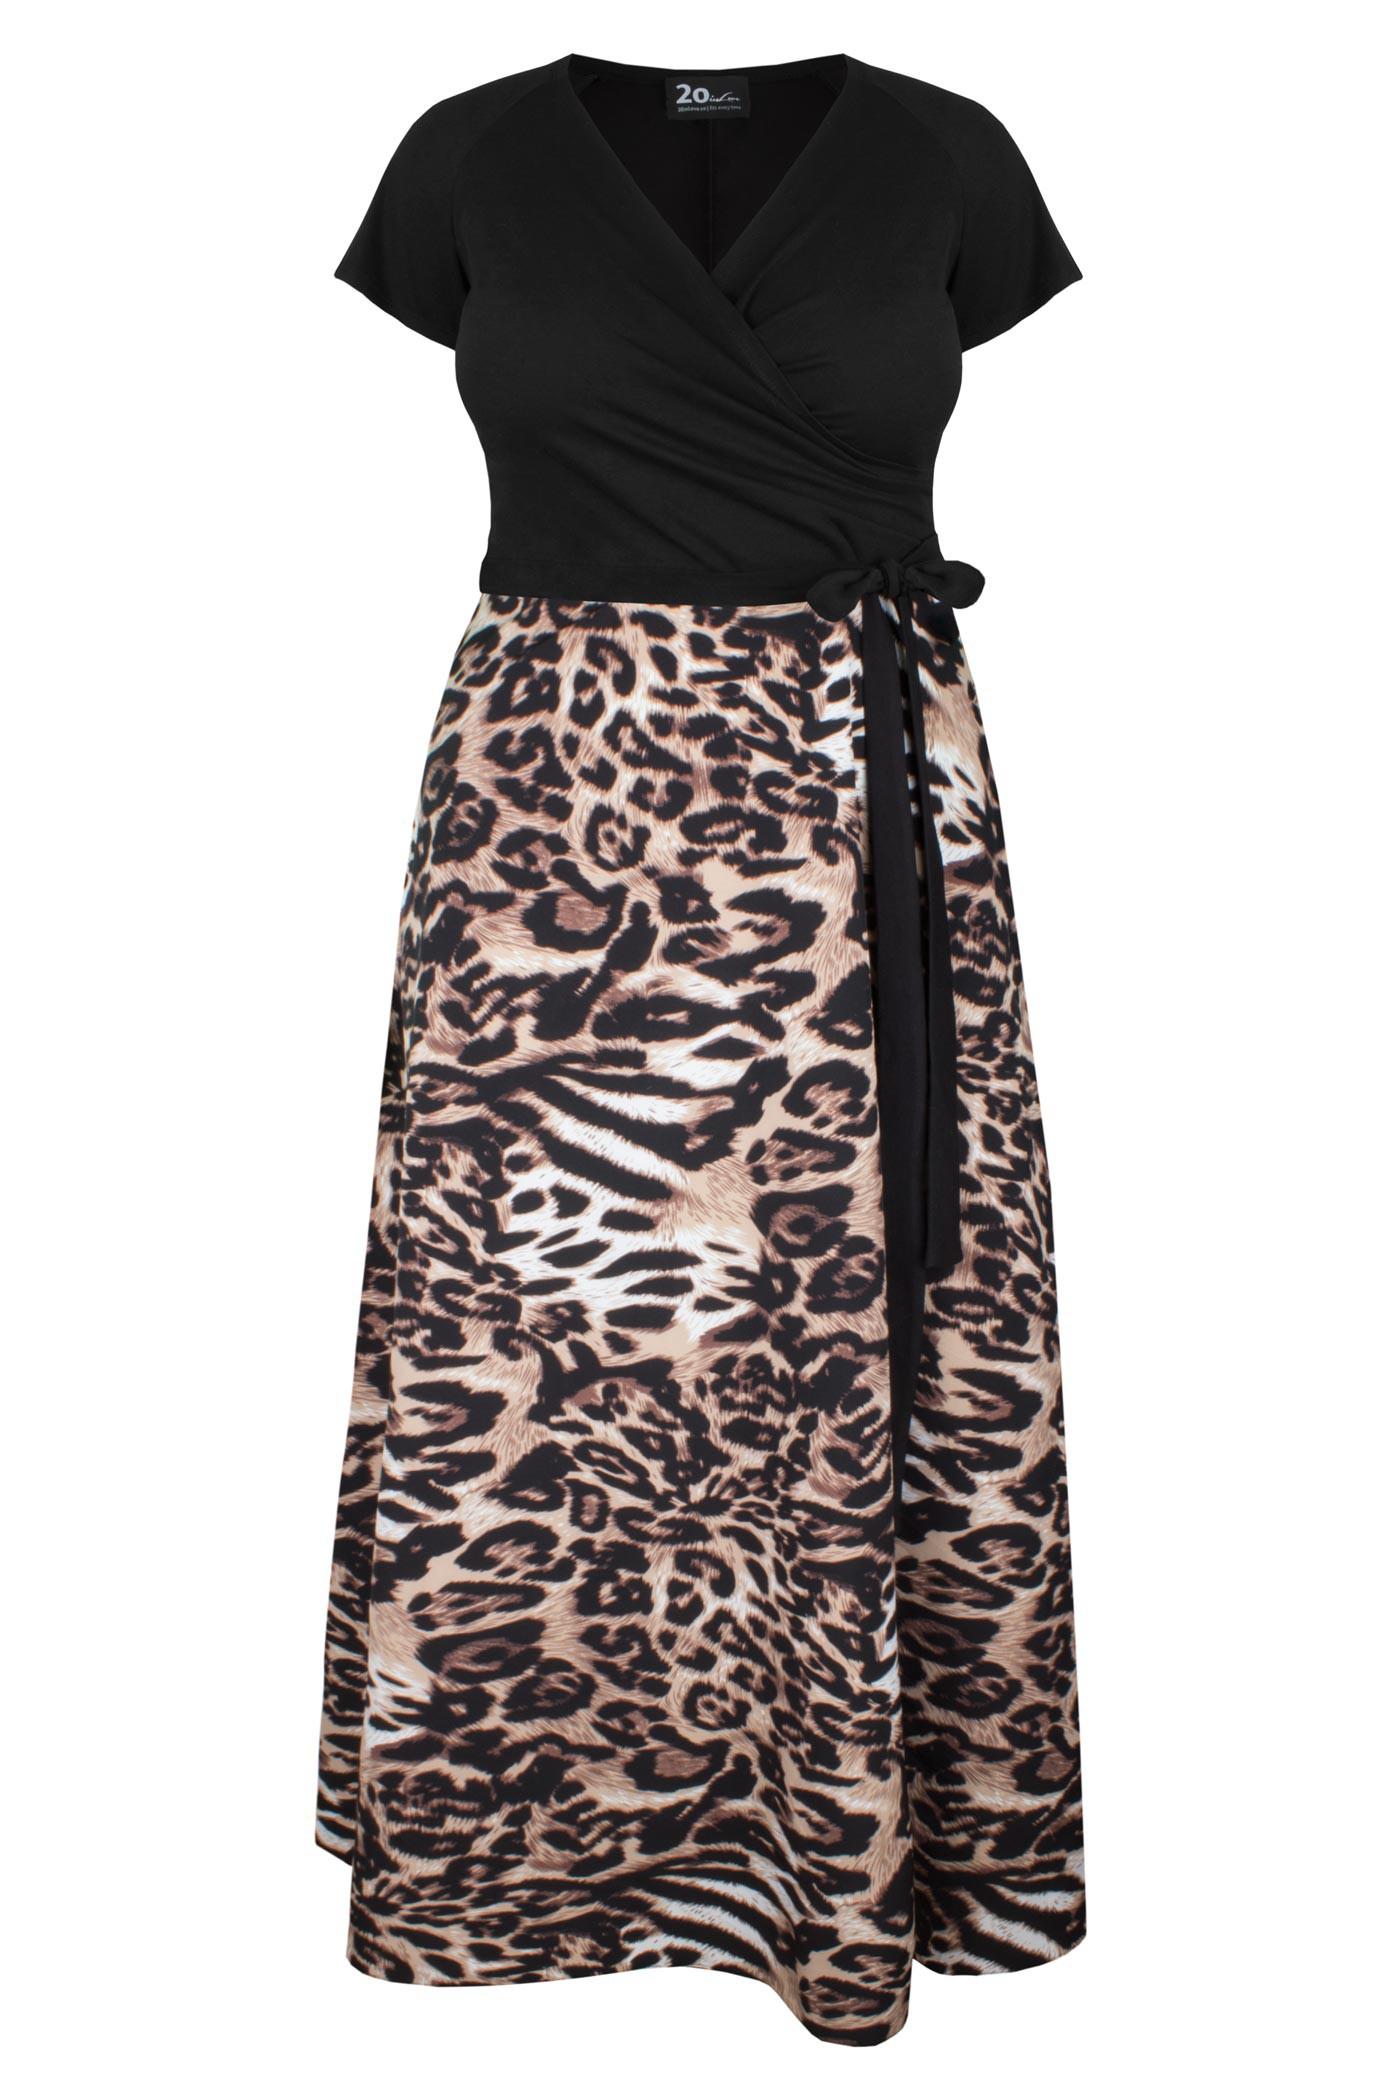 LIVIA CHITA maxi sukienka plus size w cętki